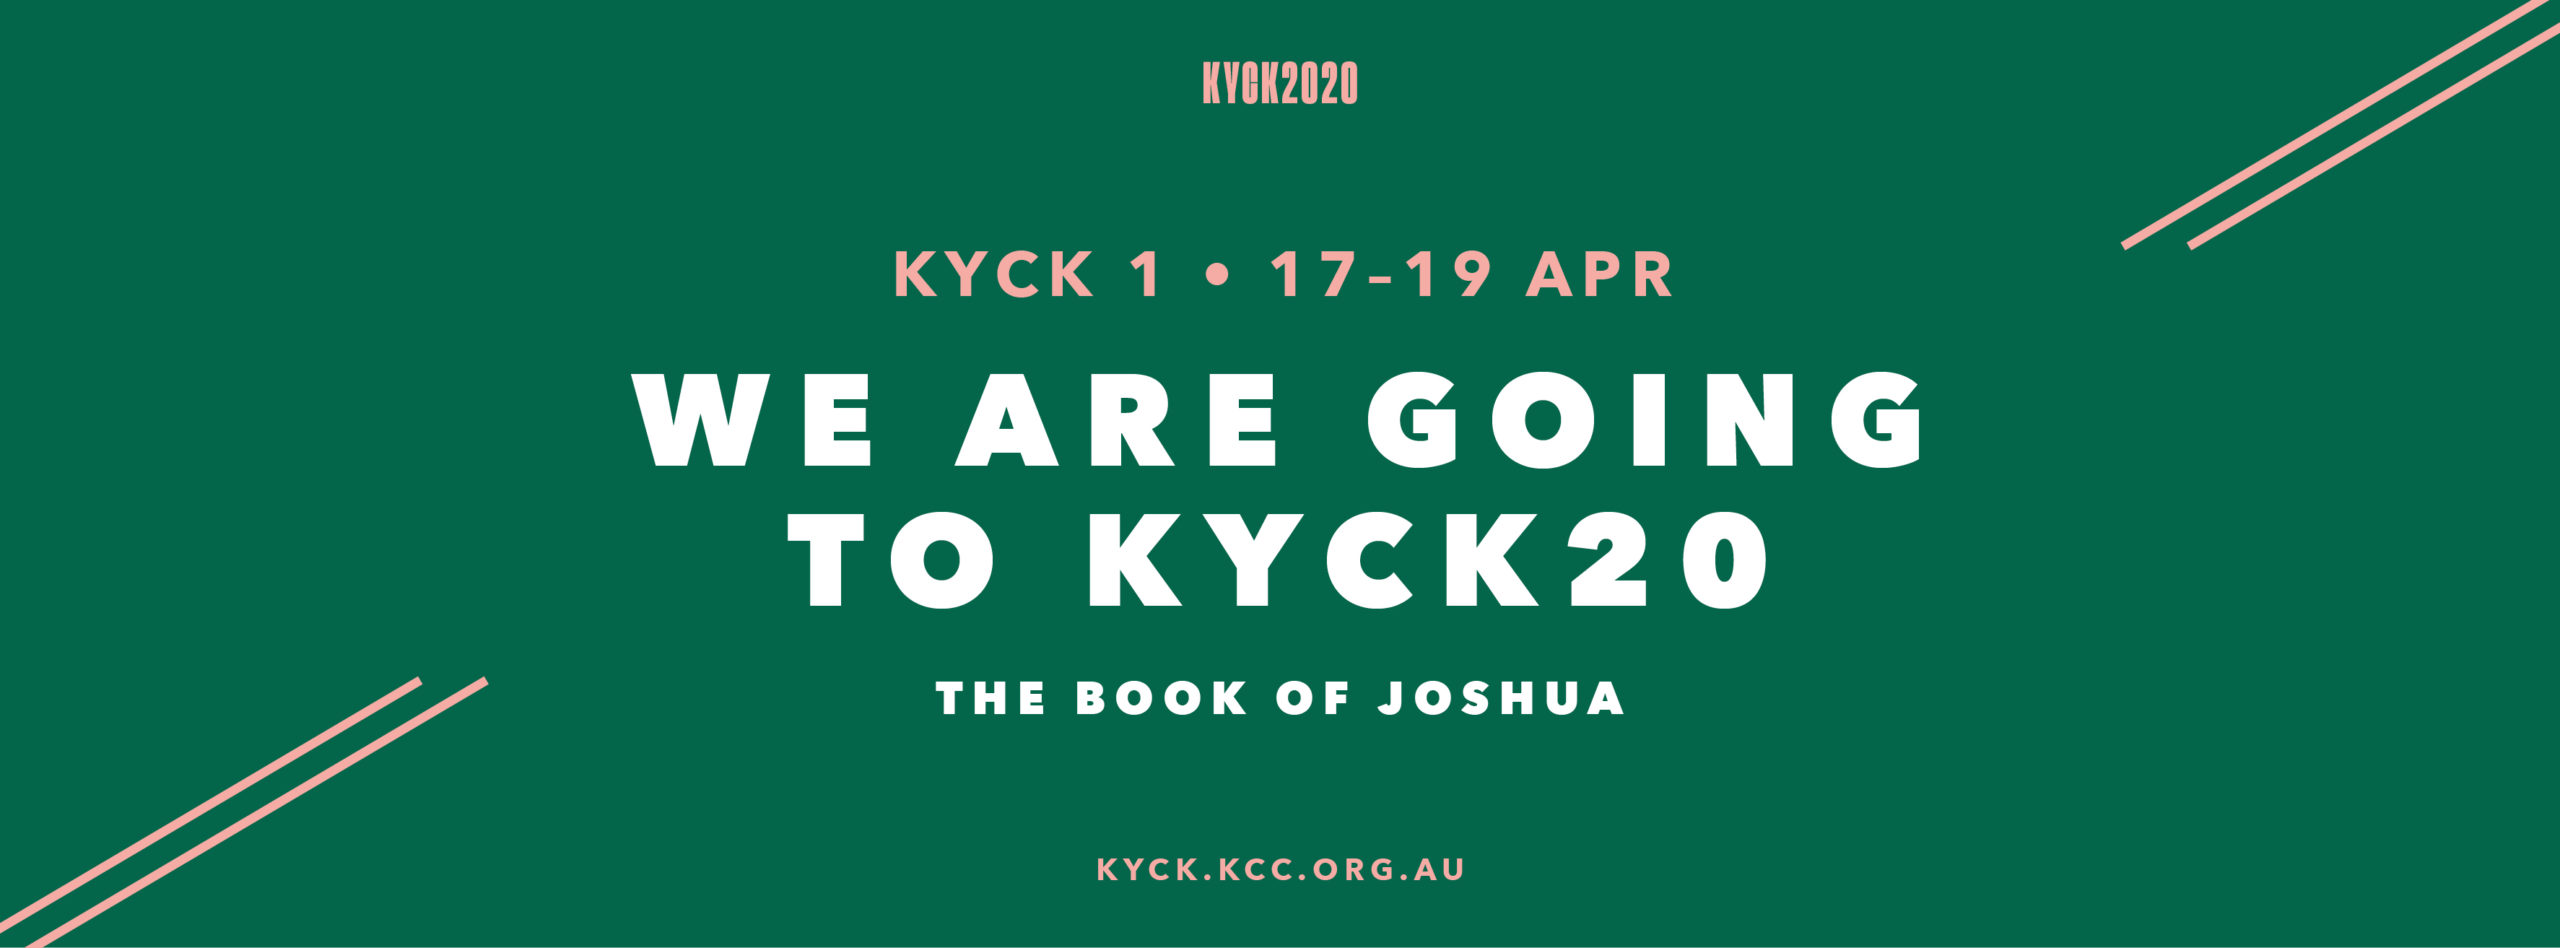 KYCK 17-19 April 2020